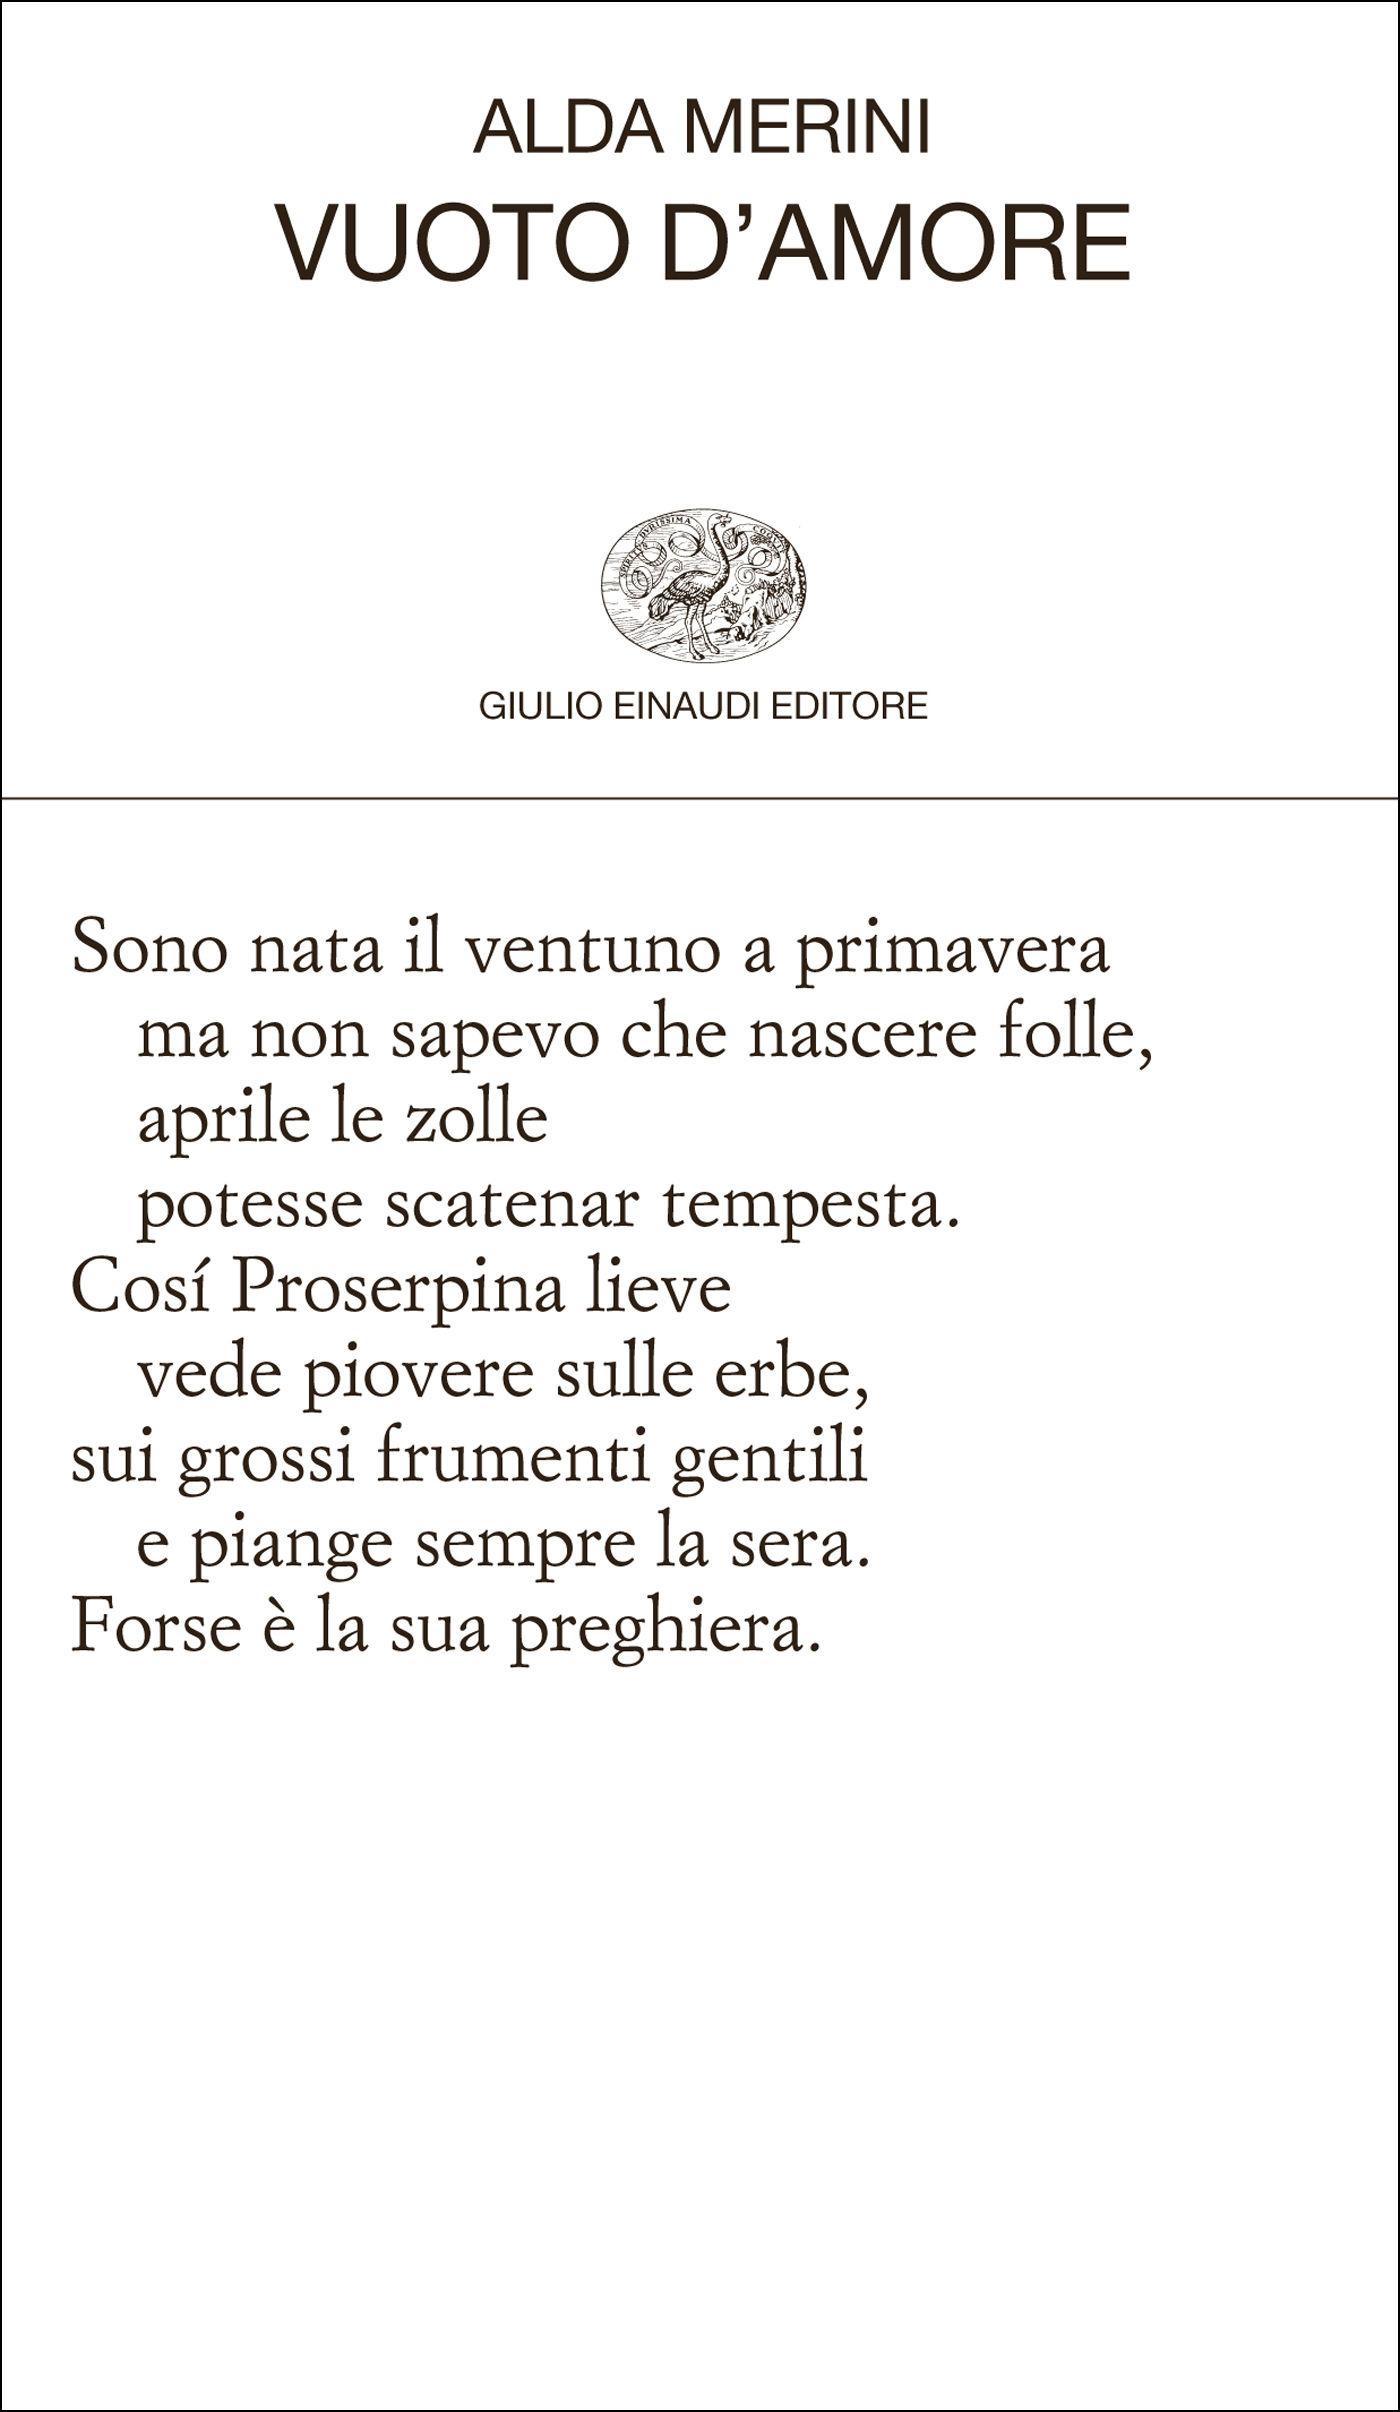 Alda Merini, Vuoto d'amore, Einaudi